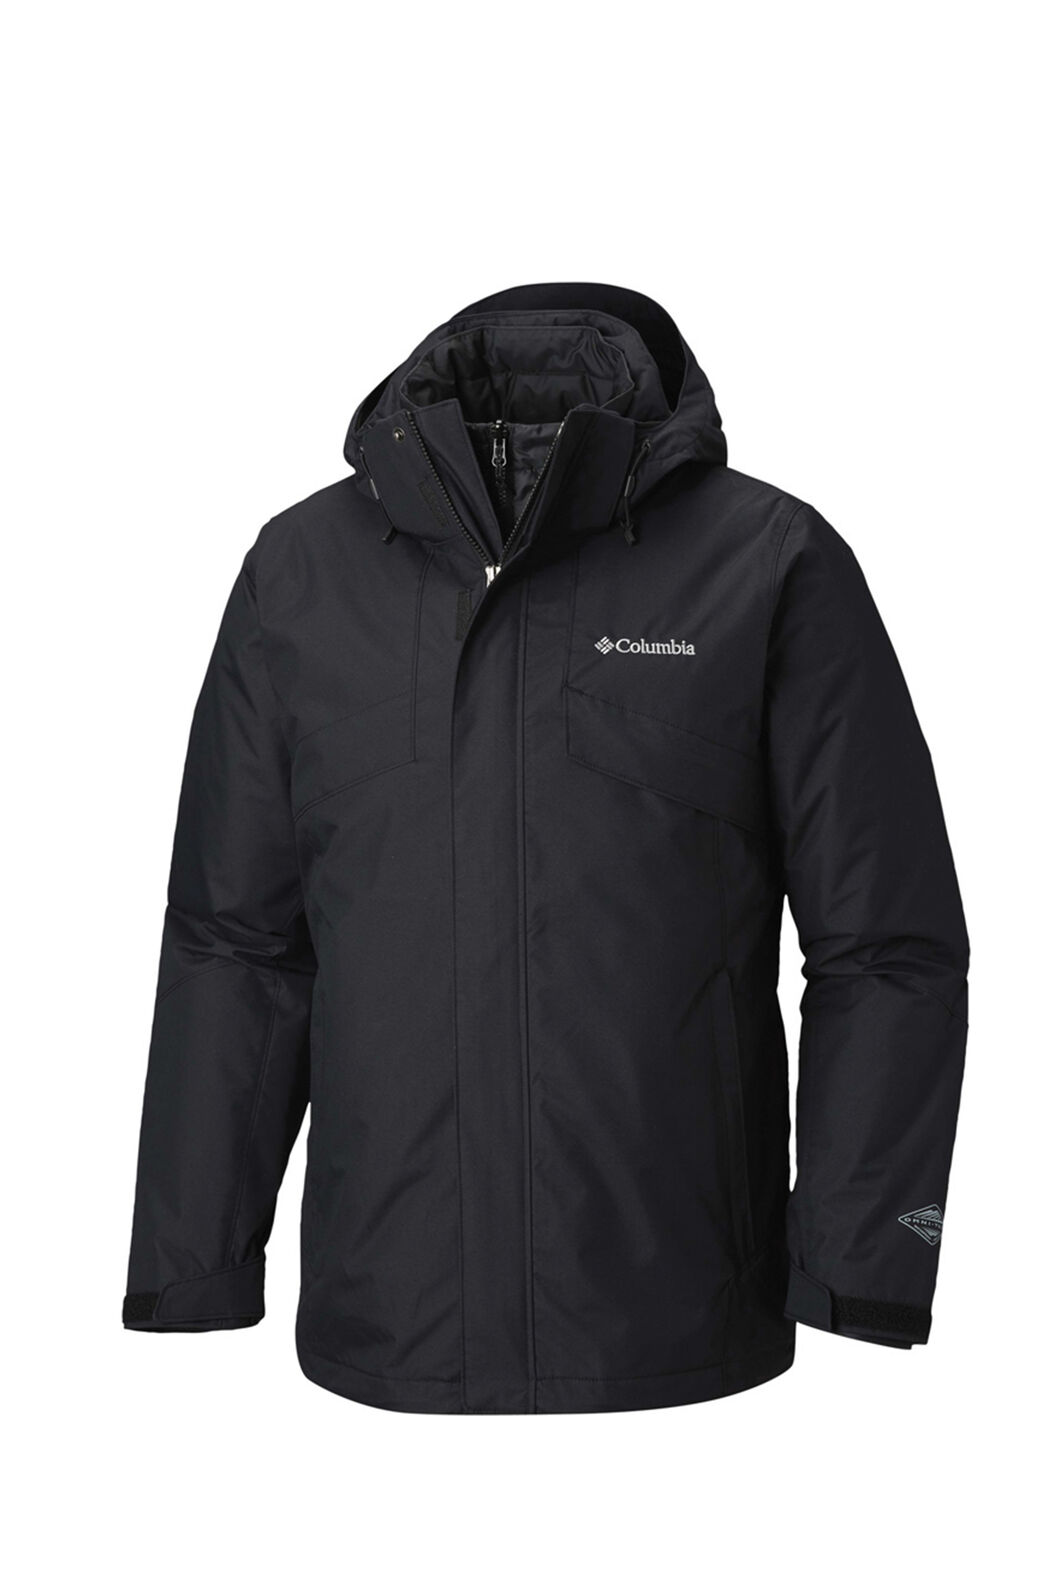 Columbia Men's Bugaboo II Insulated Interchange Jacket, Black, hi-res